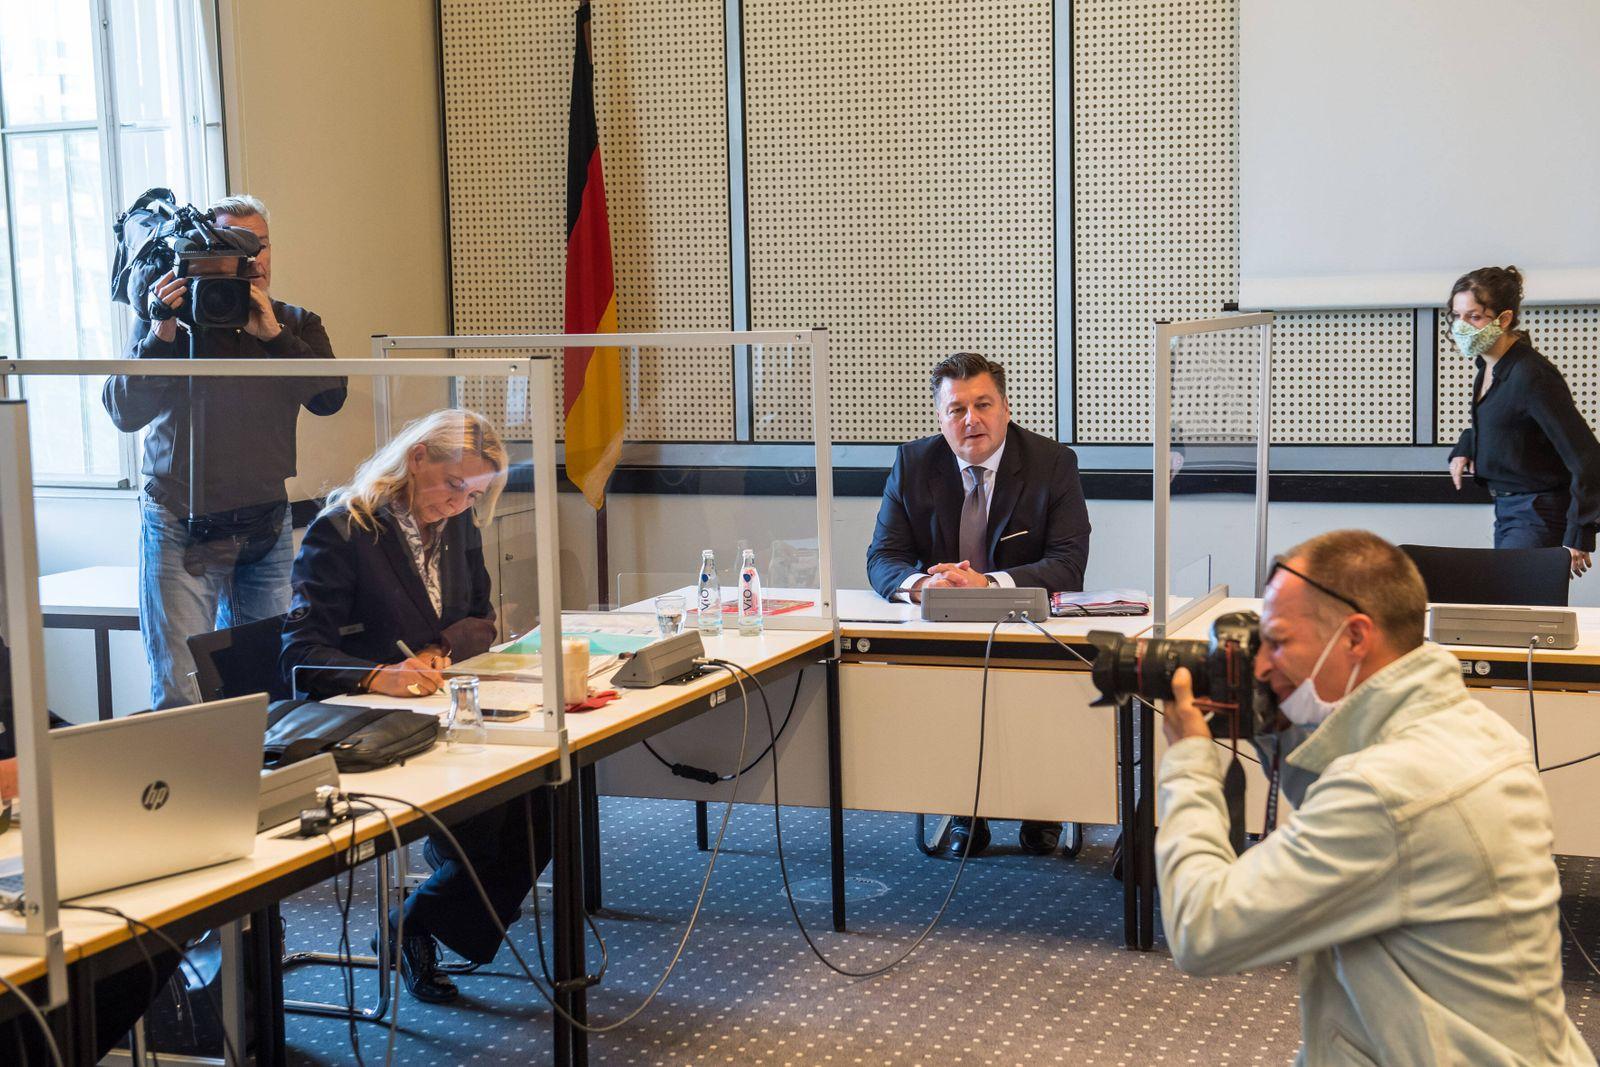 Politik Berlin Innenausschuss Sitzung des Innenausschuss des Berliner Abgeordnetenhaus am Montag den 31. August 2020. Wi